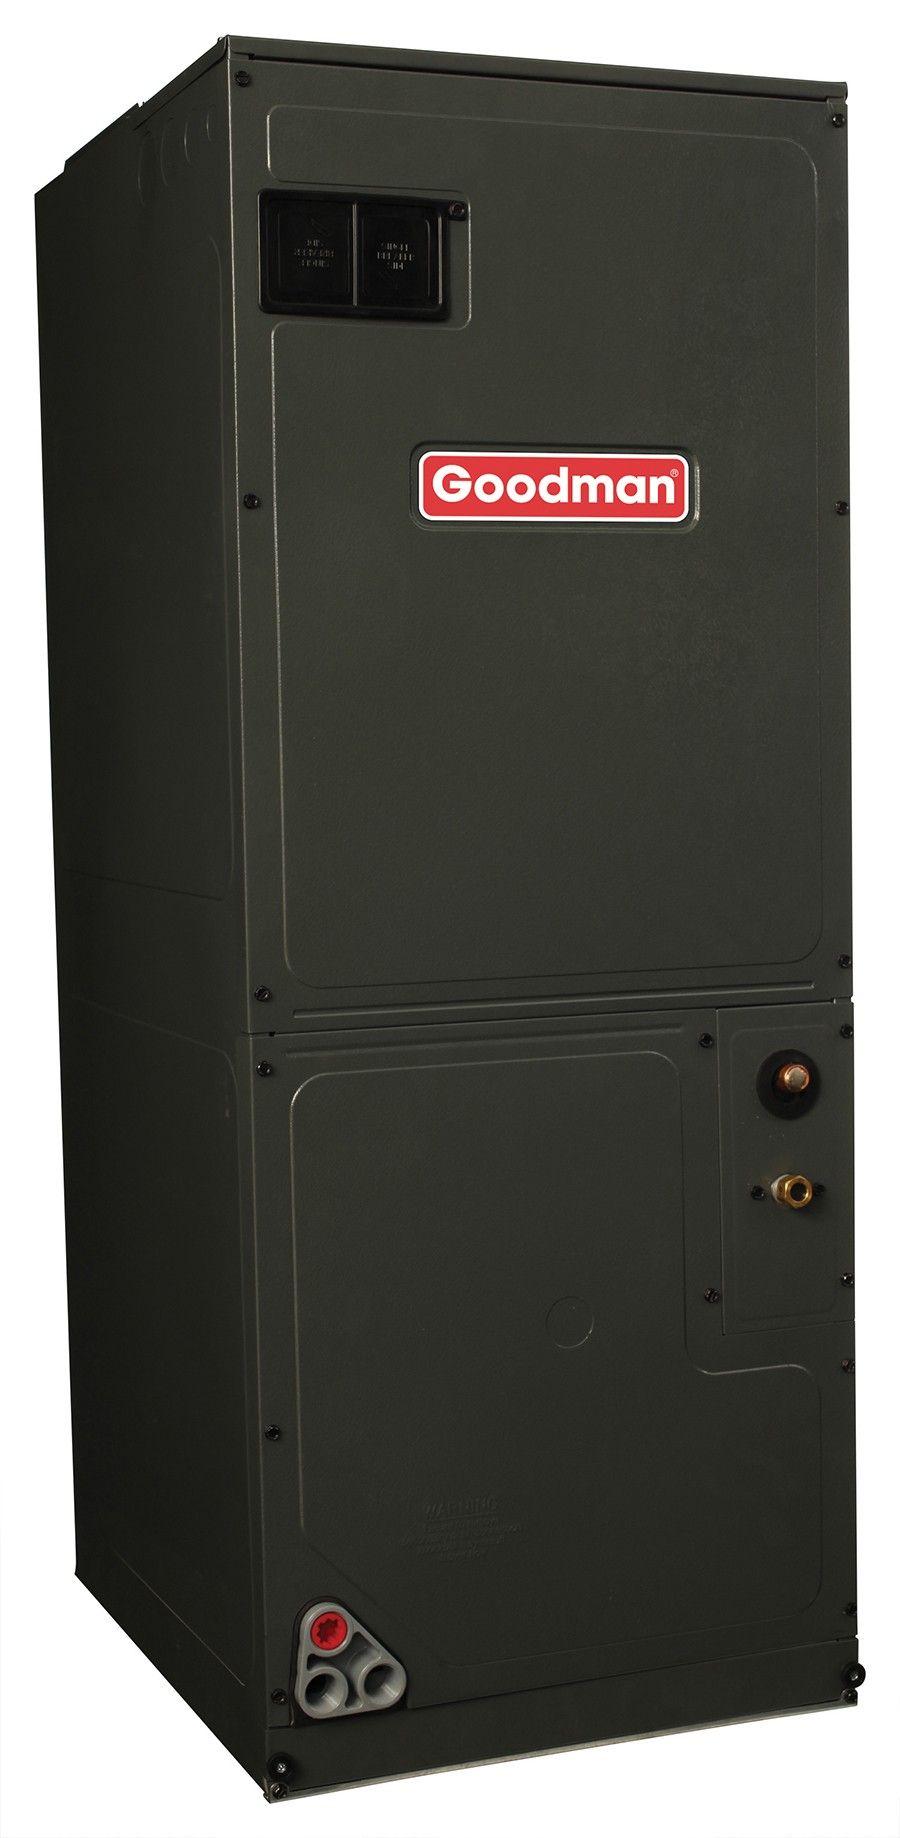 4.0 Ton Goodman AVPTC Variable Speed Air Handler